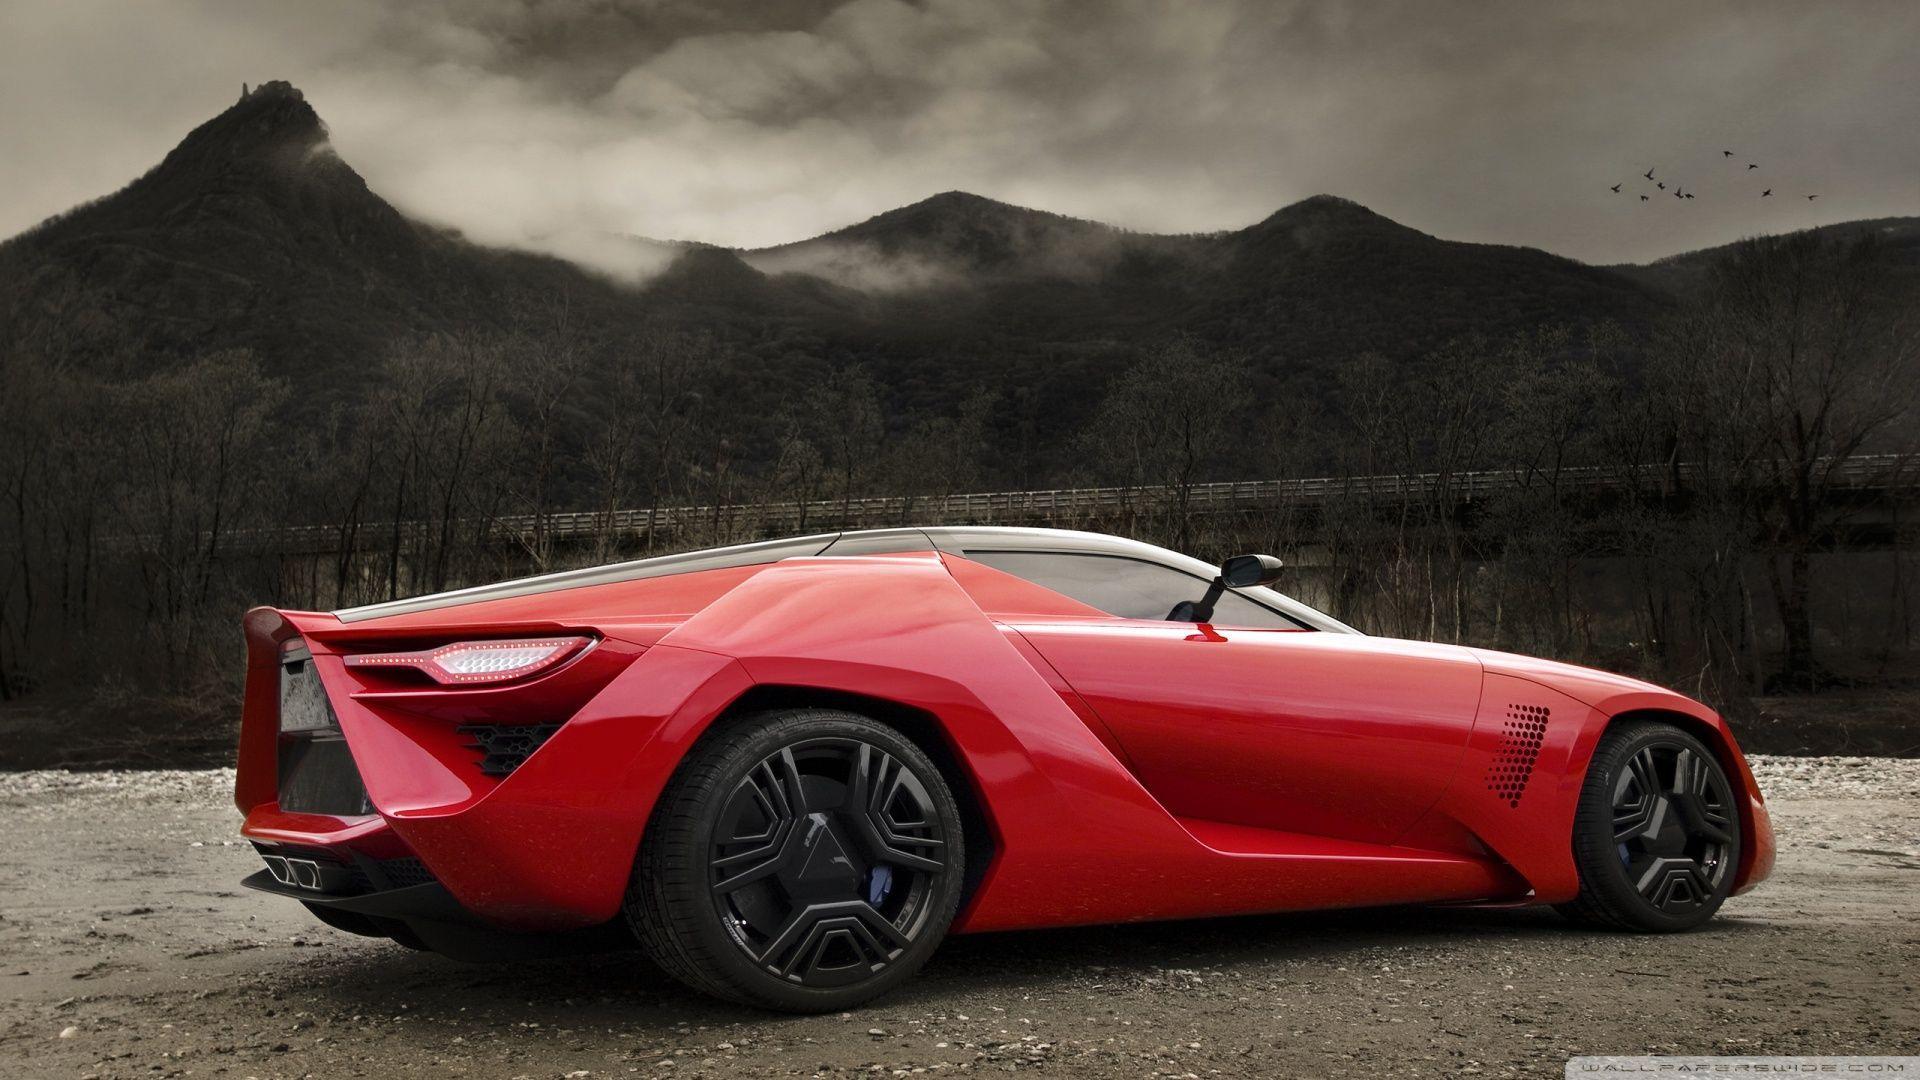 52 Best Free Super Car Hd Wallpapers Wallpaperaccess